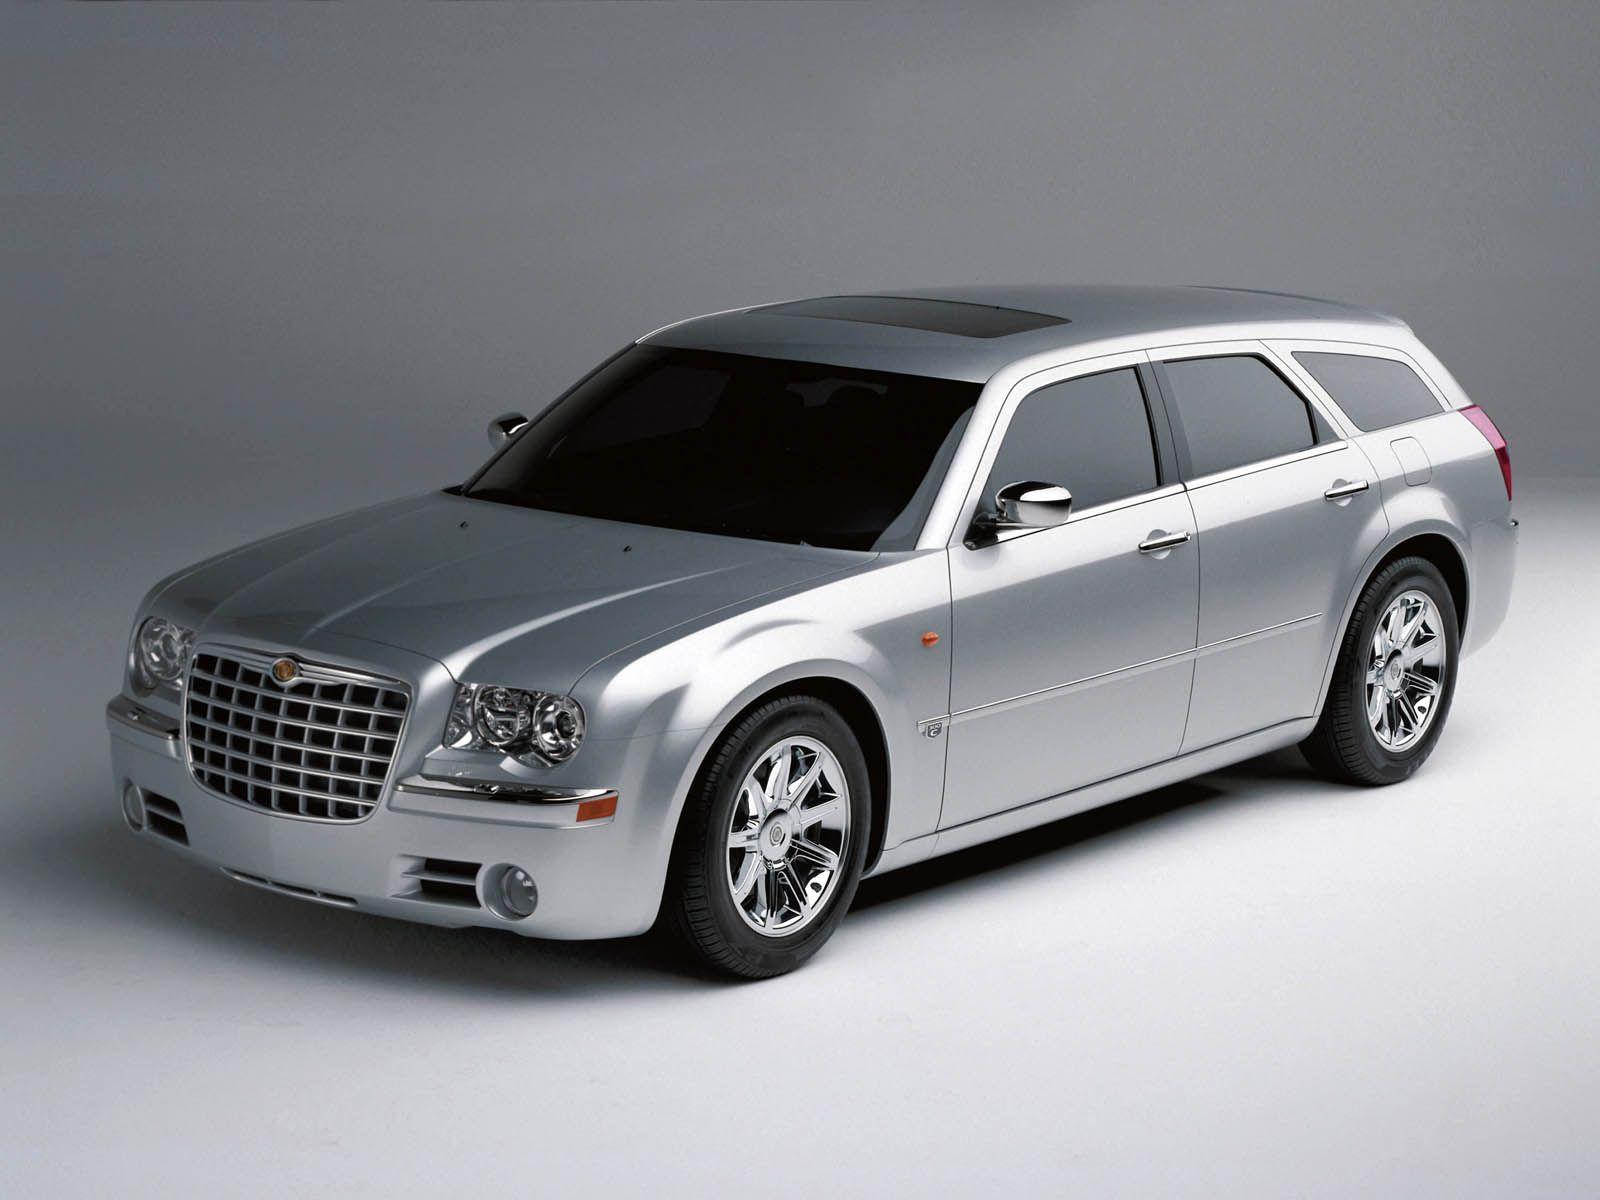 Chrysler 300 touring station wagon car picture car hd wallpaper